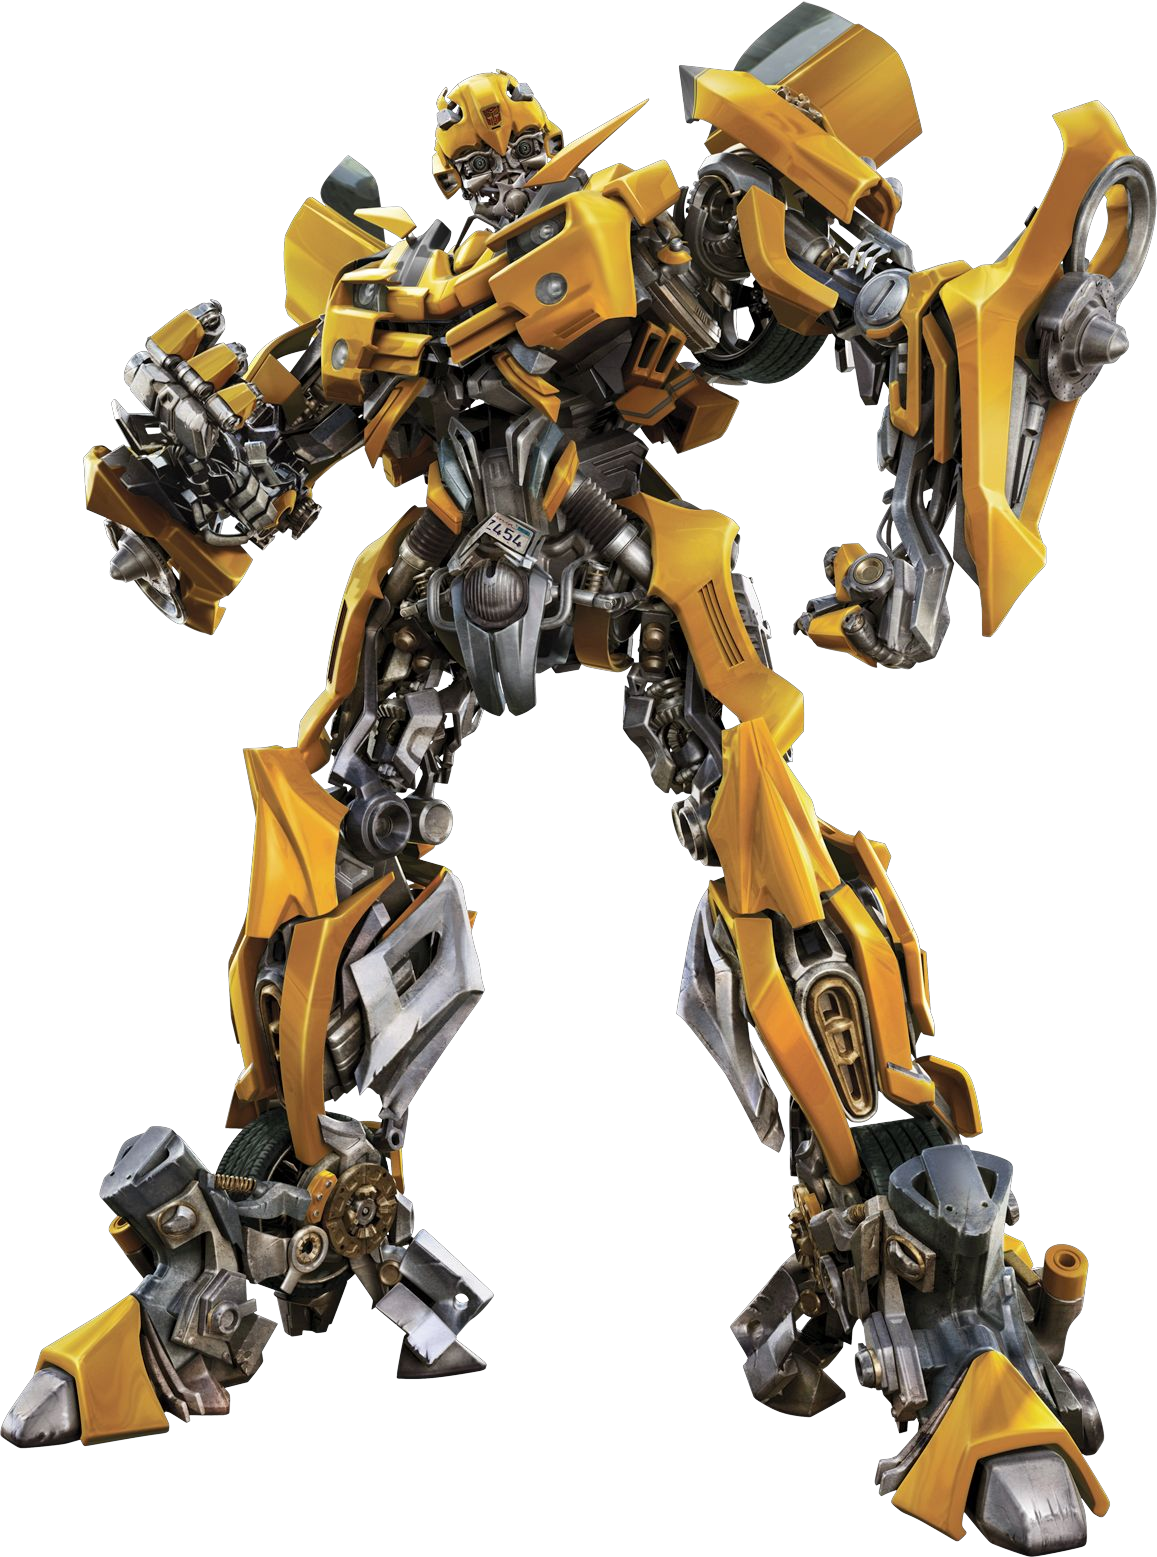 Transformers 3 Illuminati Masonic Deceptaconic Hidden Messages! NOTES